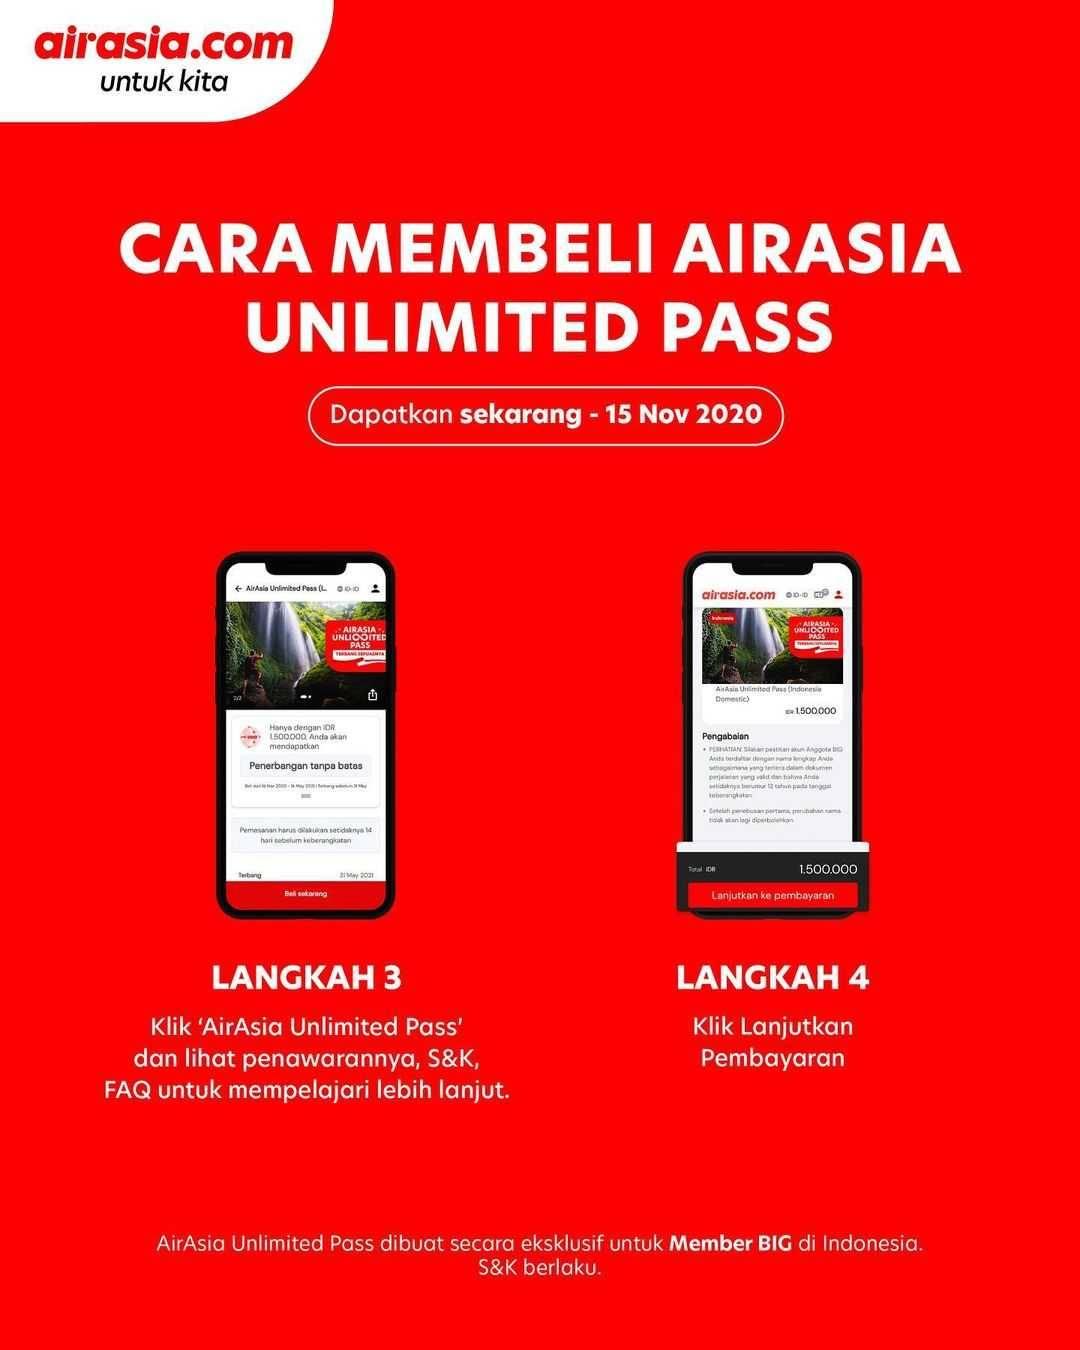 Promo diskon Airasia Promo Unlimited Pass Unutk Member BIG